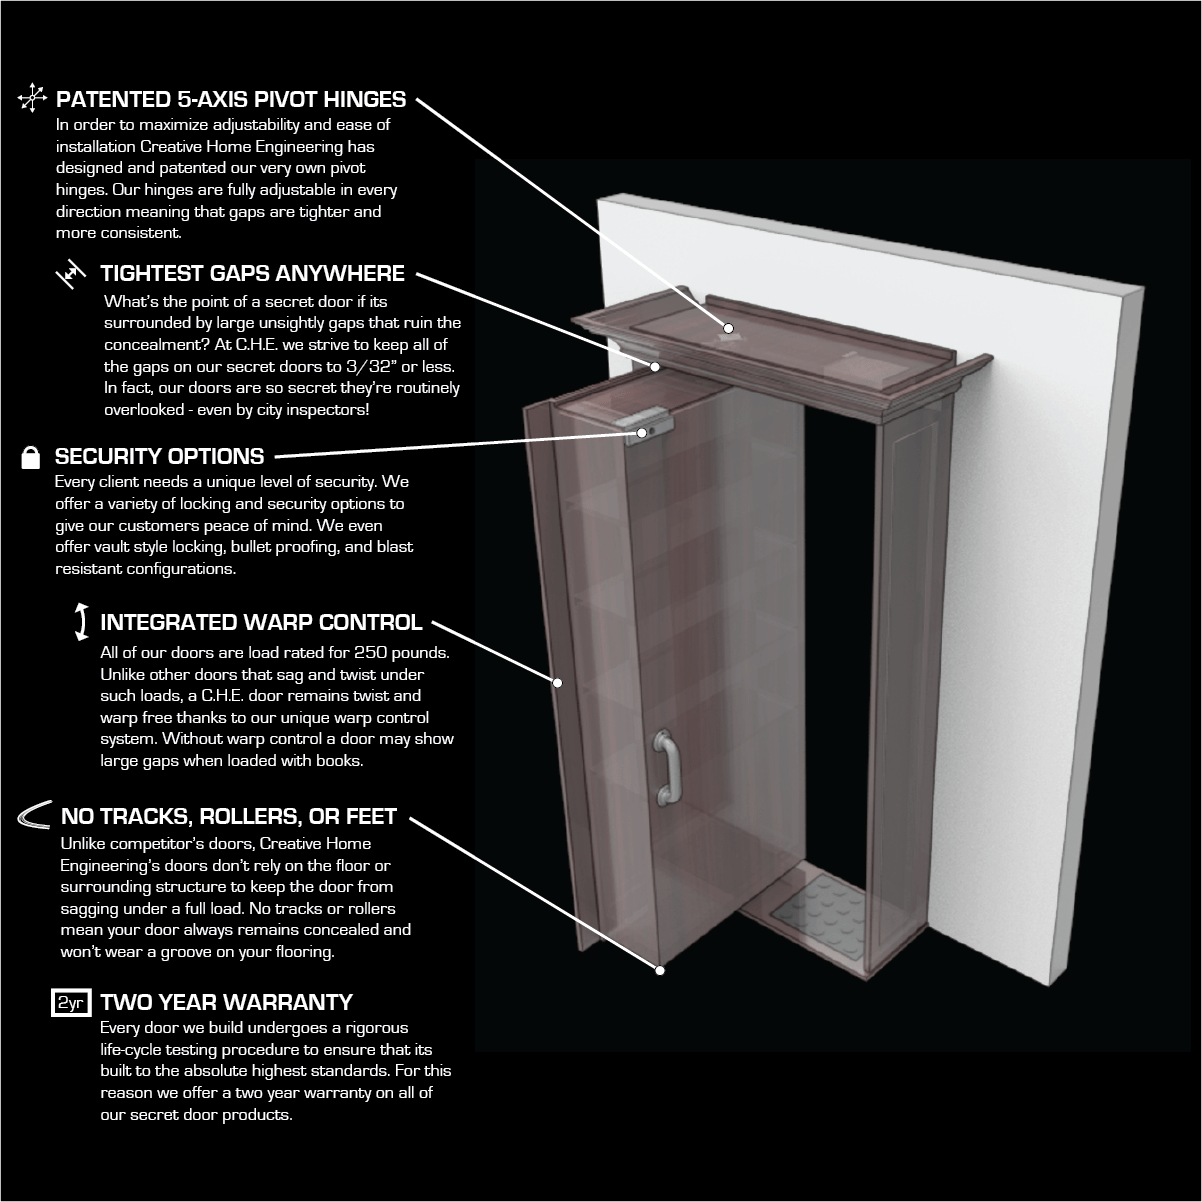 Anatomy Of Che Doors Creative Home Engineering